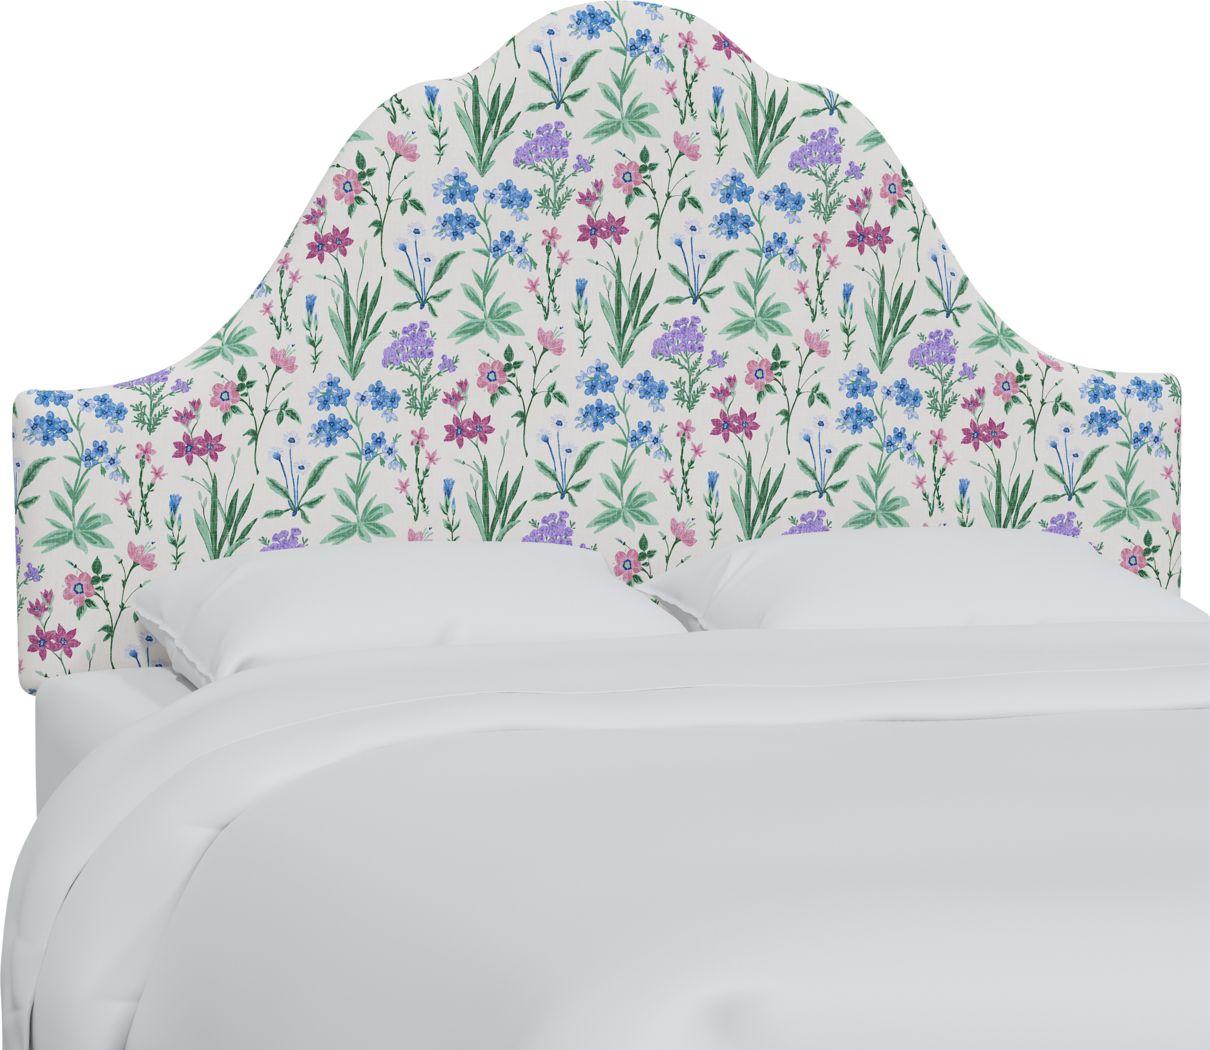 Aquaflor Blue Queen Upholstered Headboard